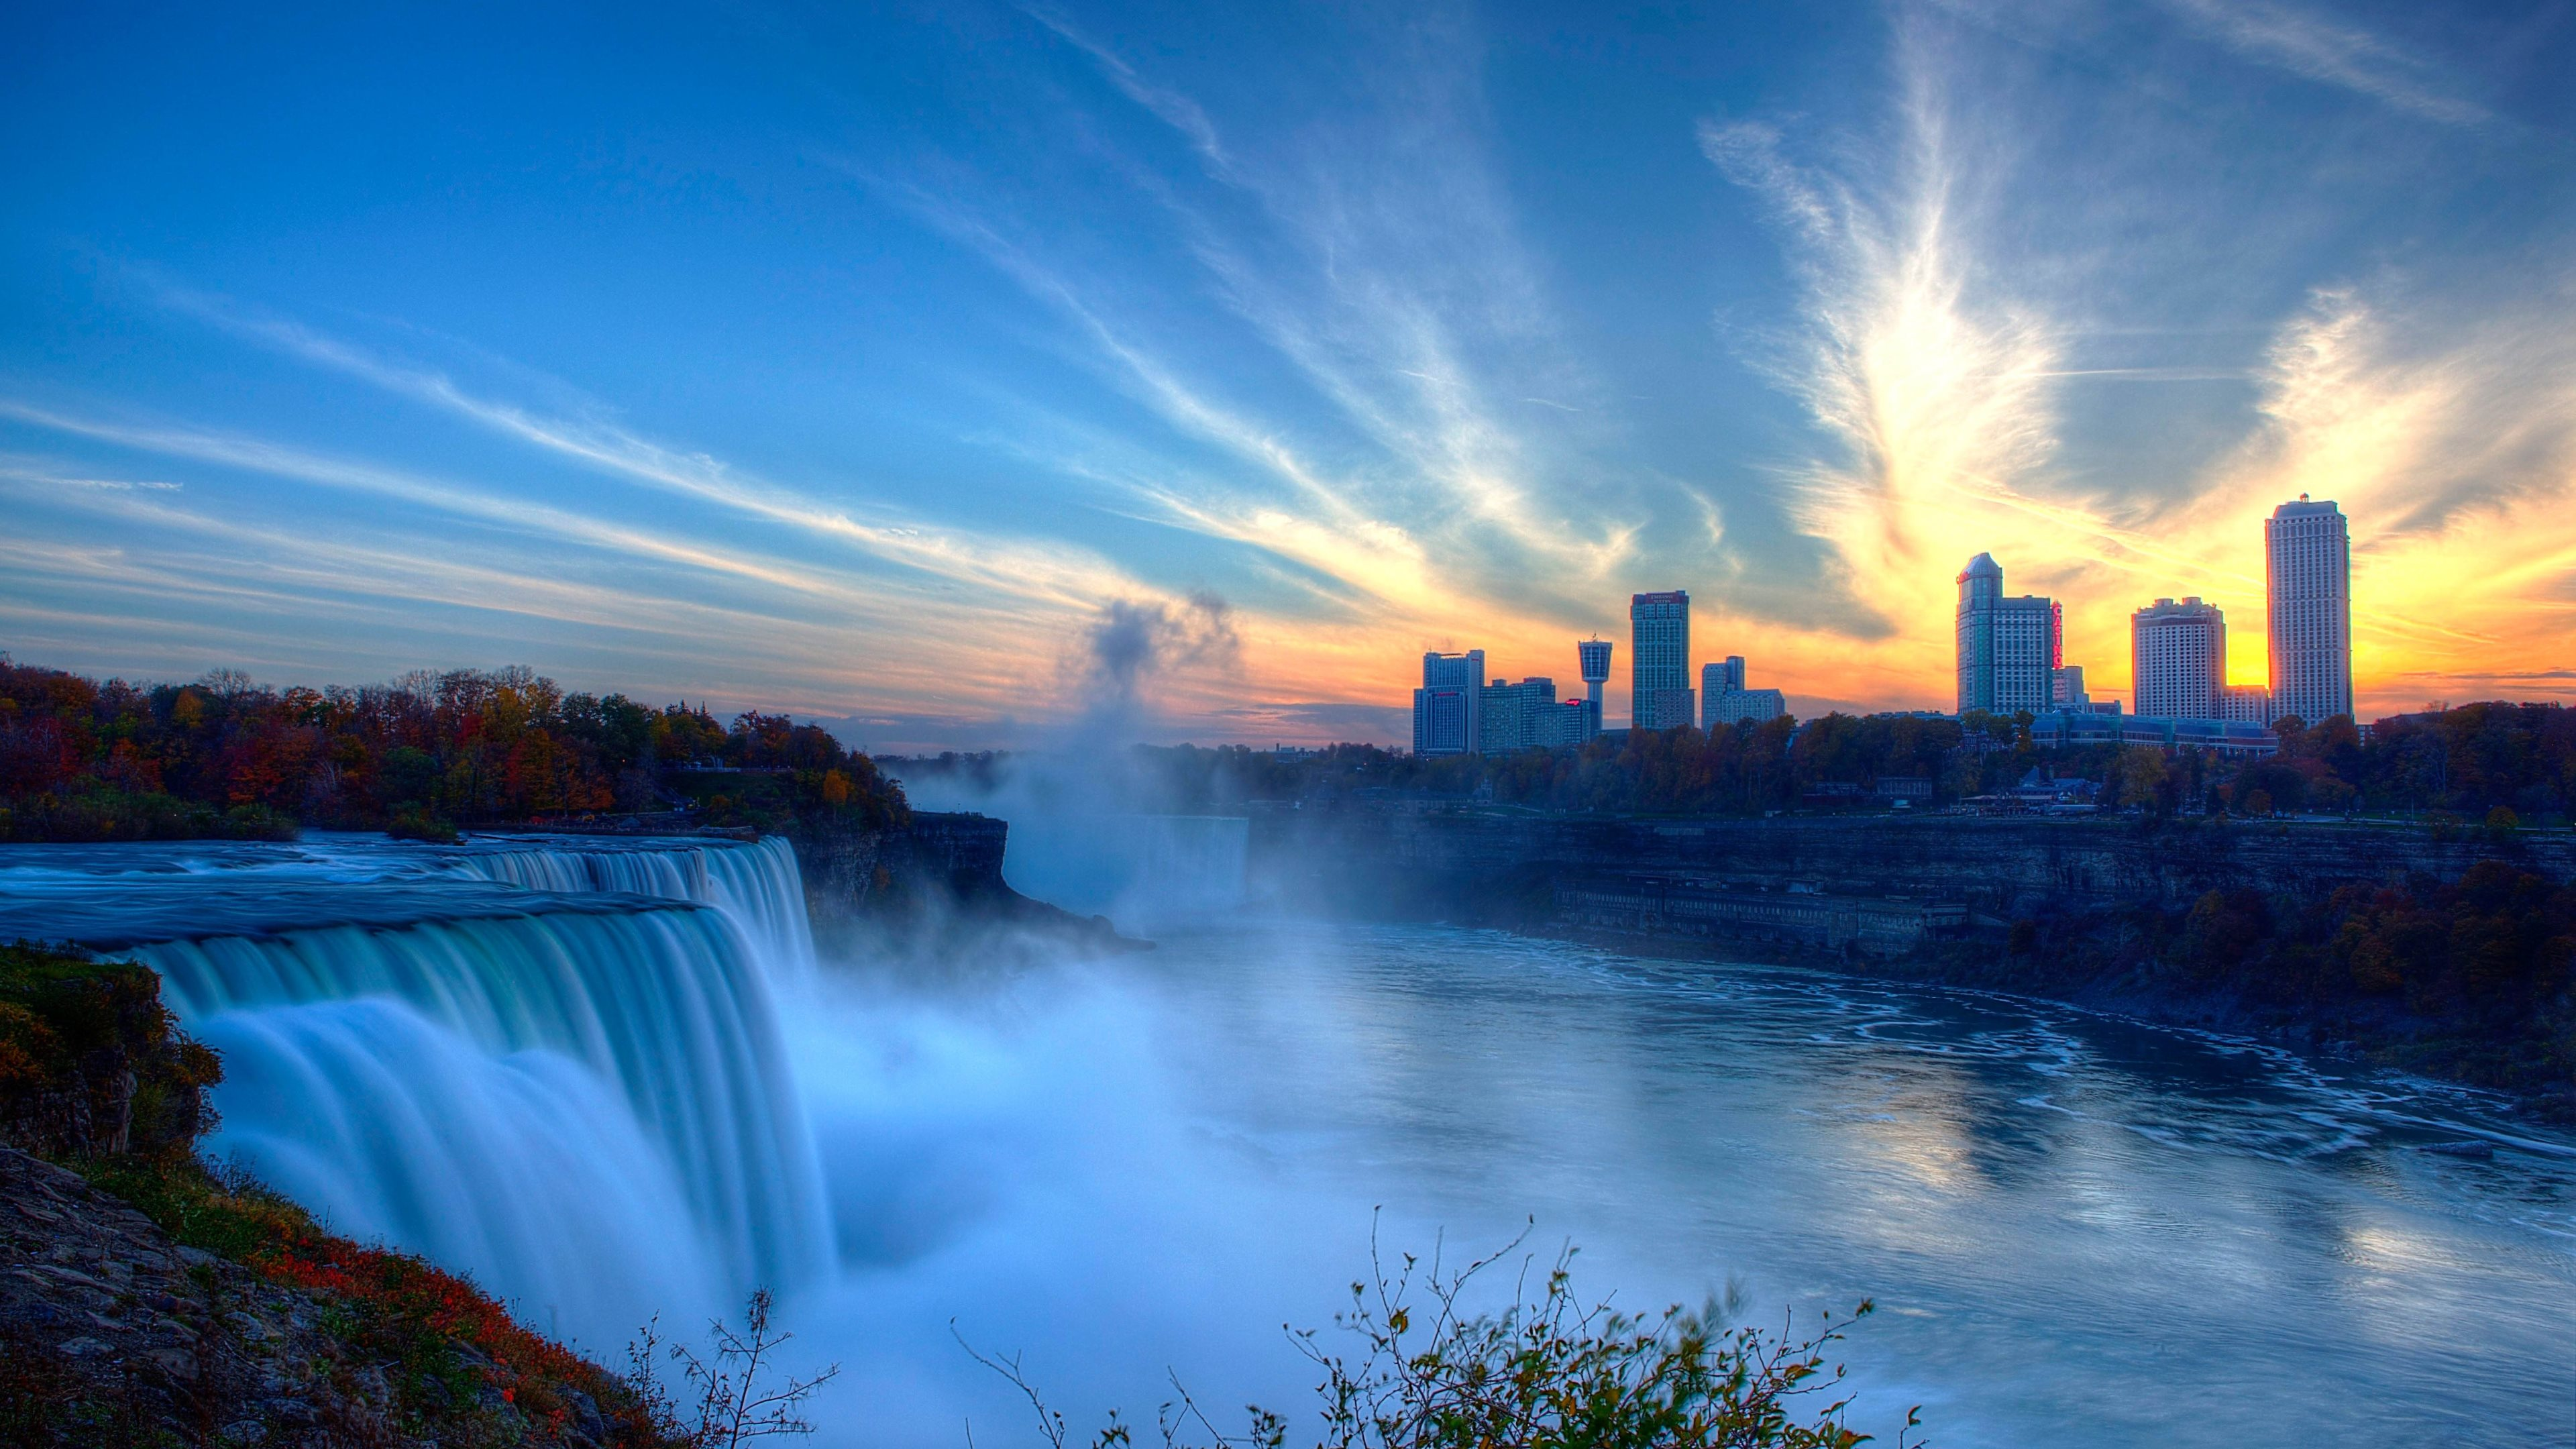 Niagara Falls Ultra HD wallpaper UHD WallpapersNet 3840x2160